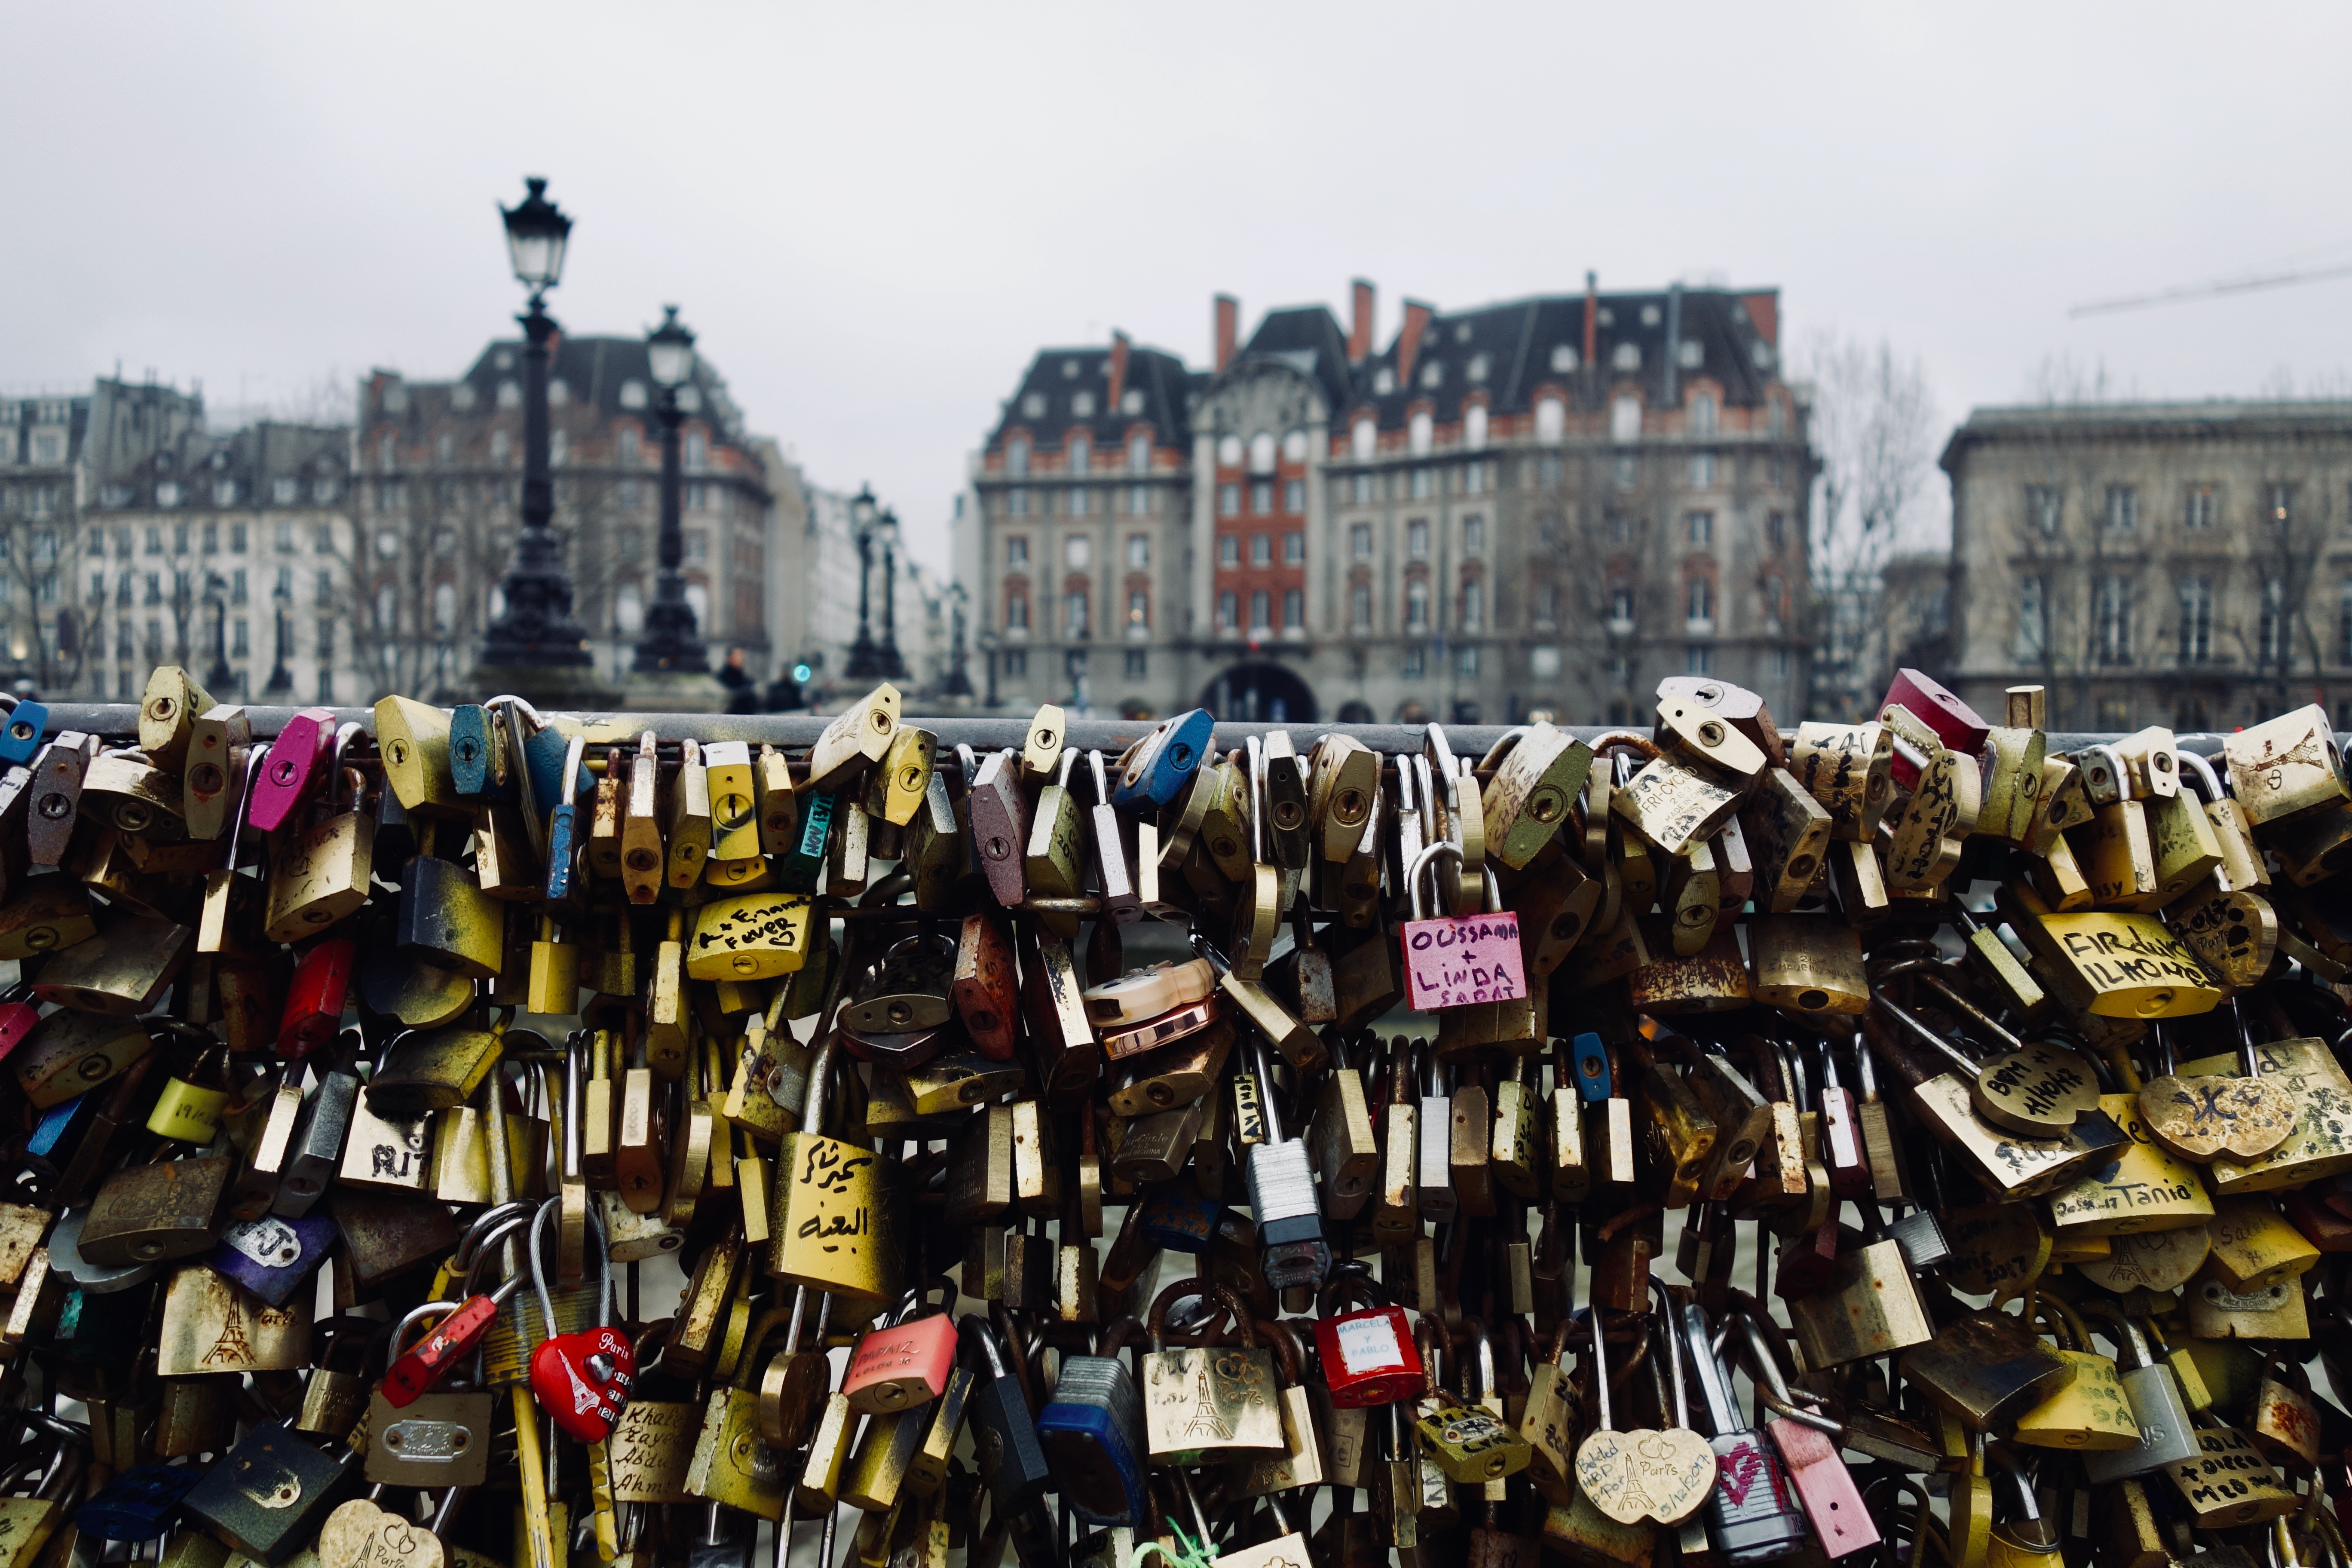 A Weekend Trip to Paris While Teaching English in Europe